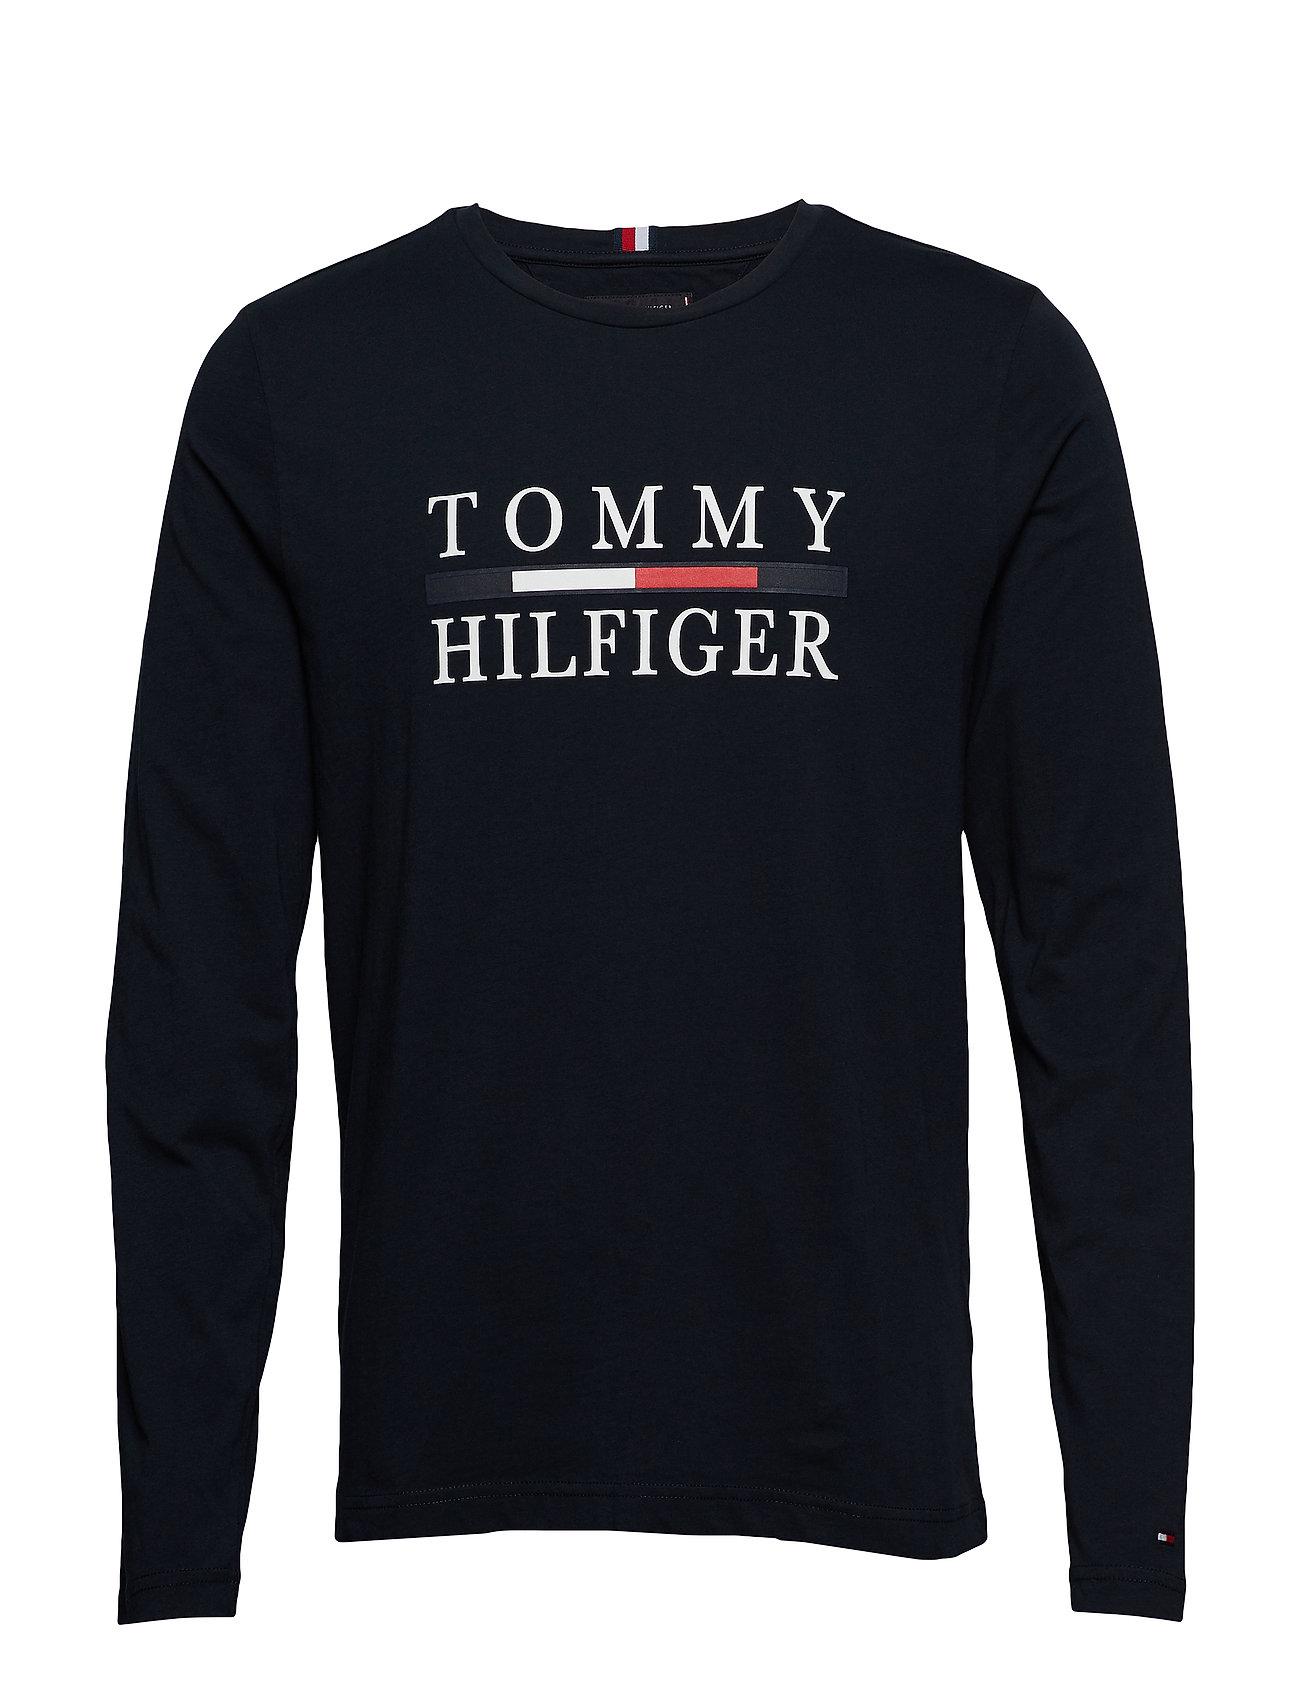 Tommy Hilfiger TOMMY HILFIGER LONG, - SKY CAPTAIN